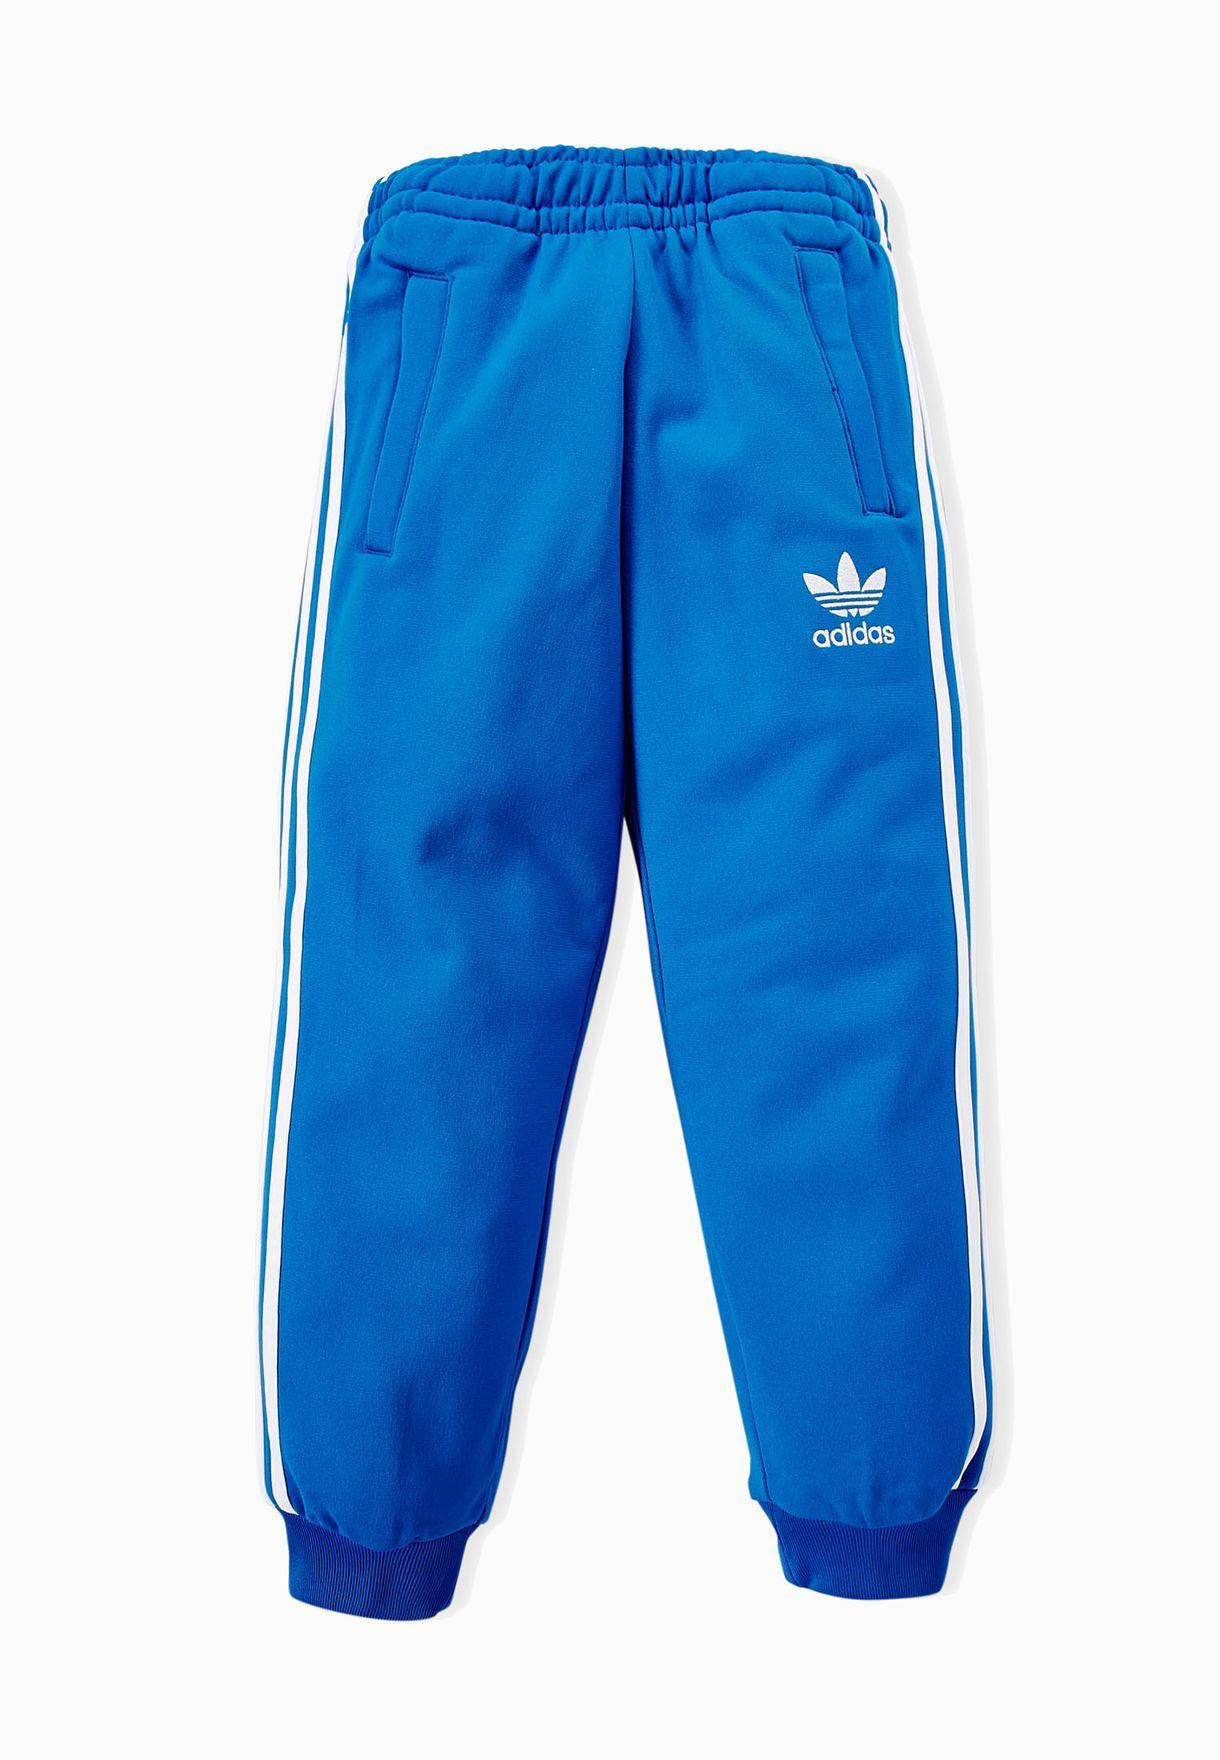 5c7840ea874d Shop adidas Originals blue Youth Superstar Sweatpants S96114 for ...